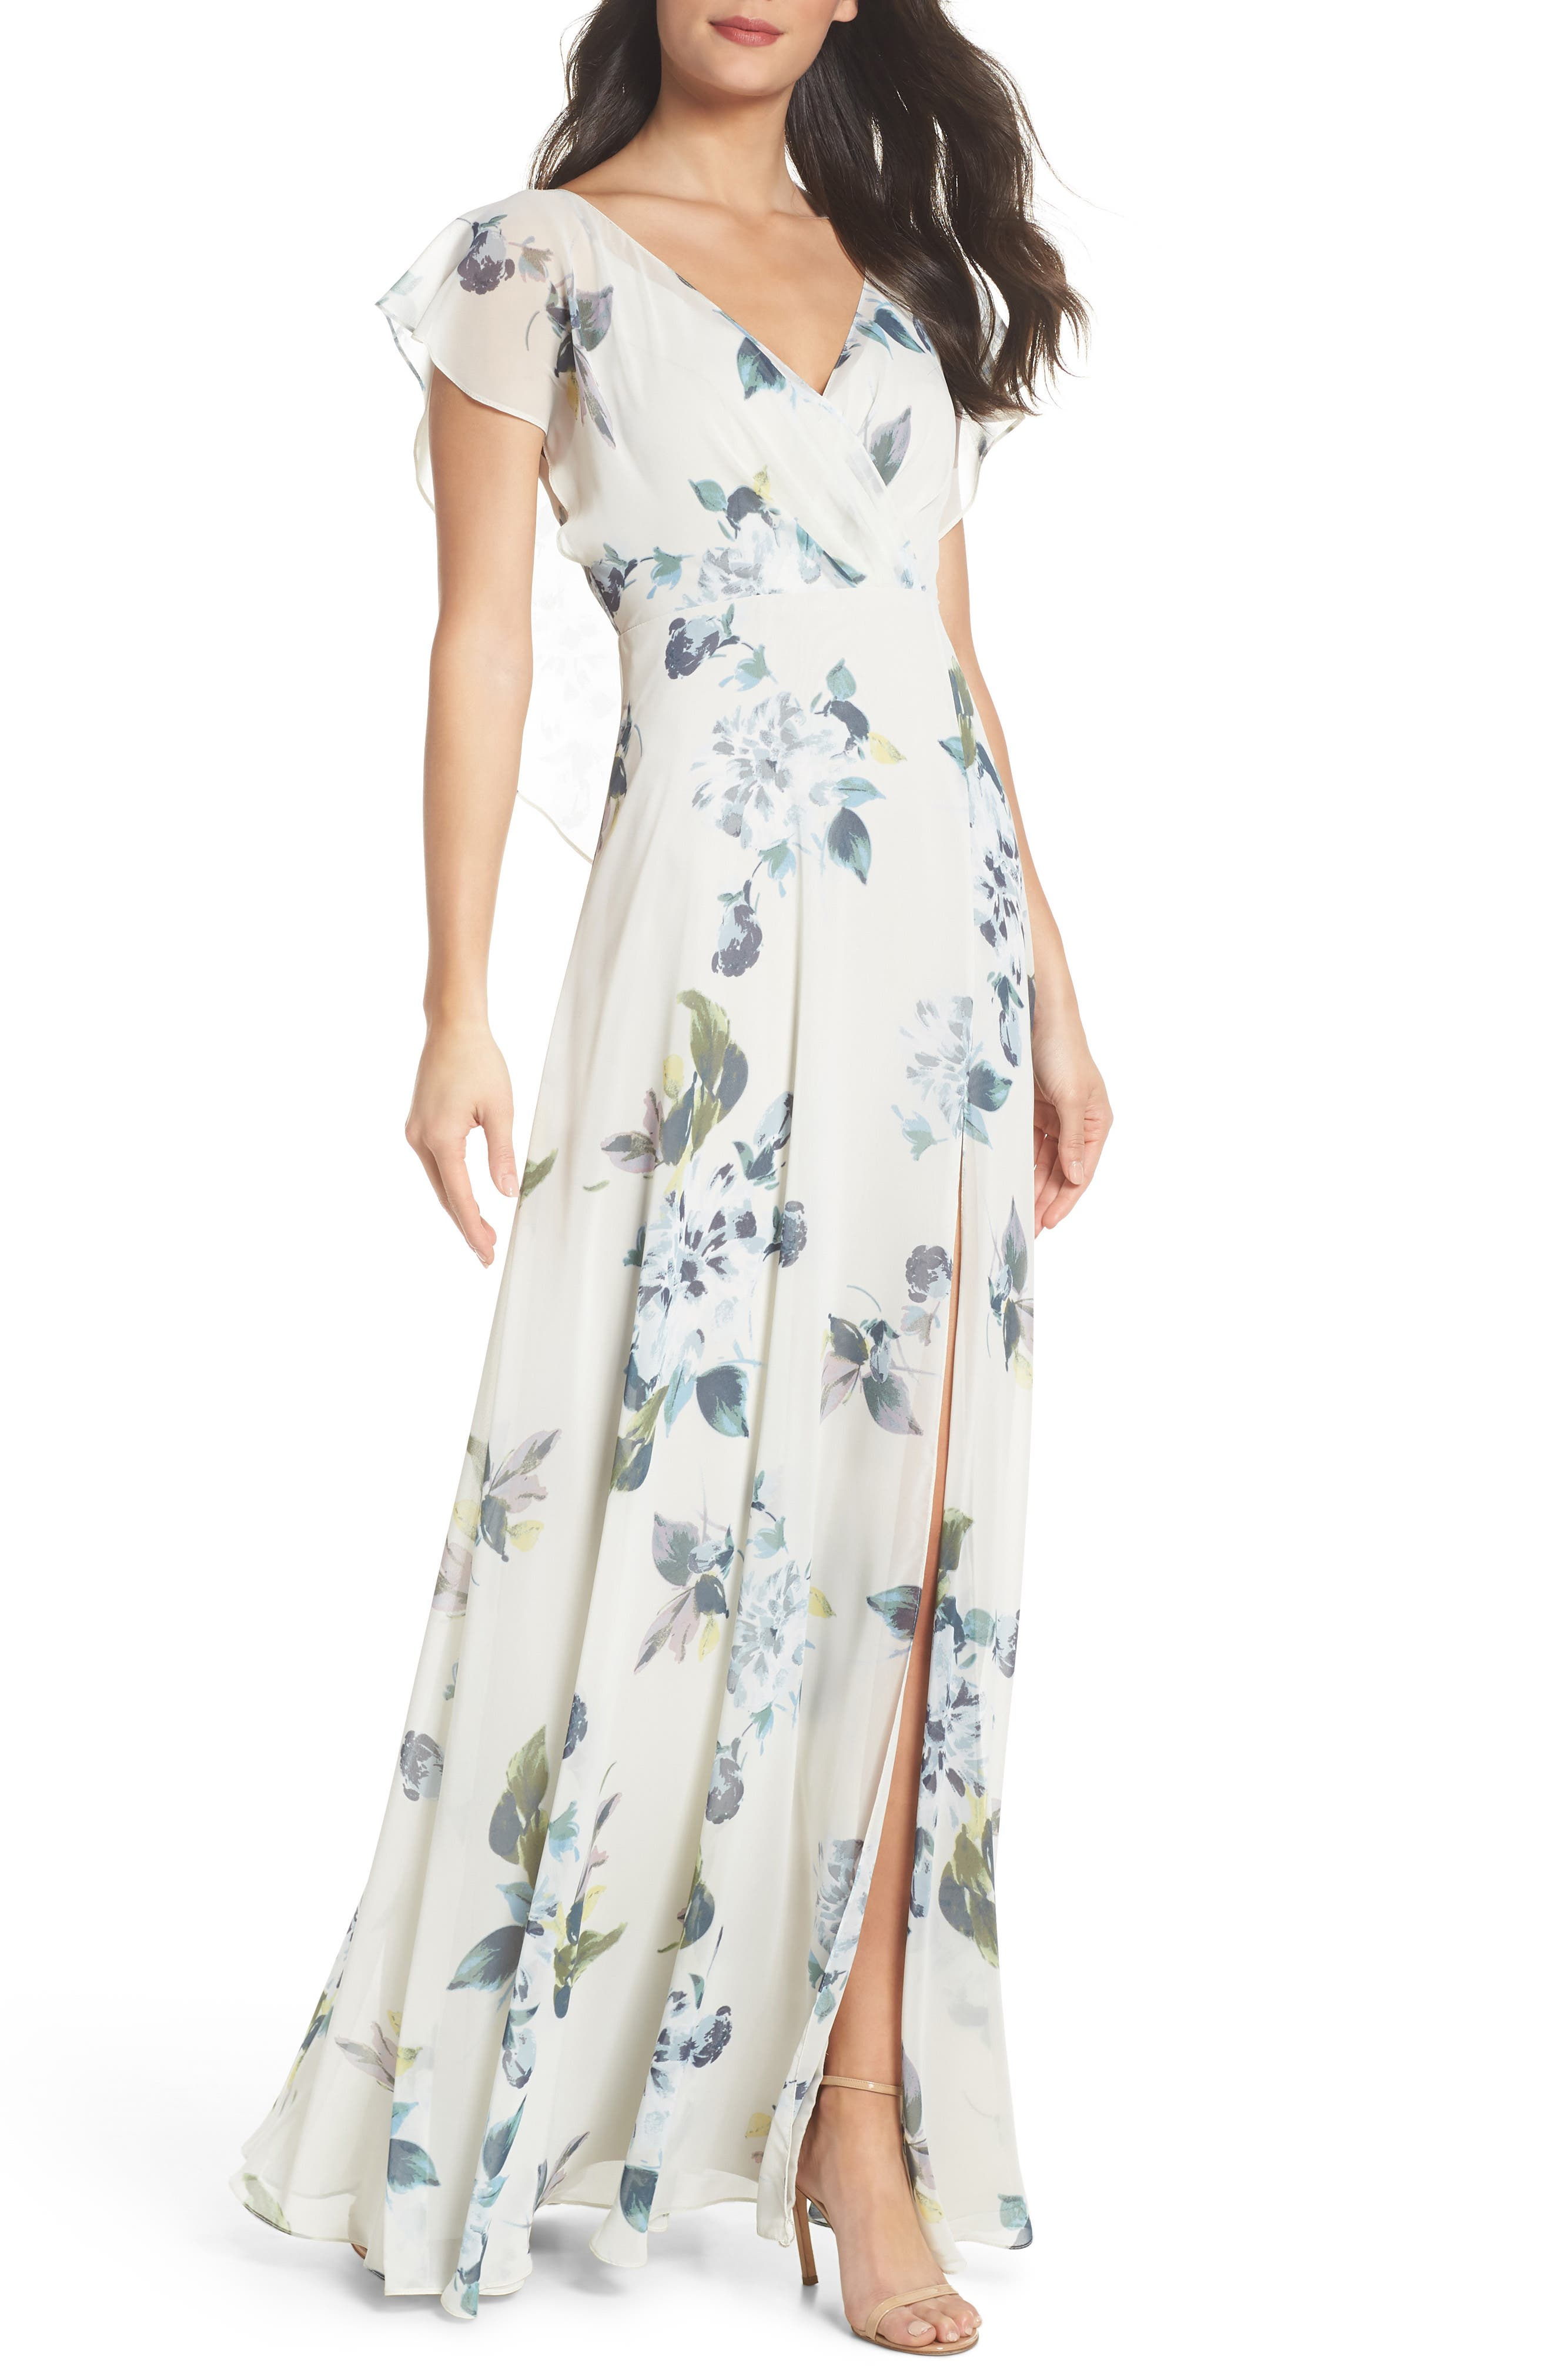 Alanna Ohana Print Open Back Print Chiffon Gown,                             Main thumbnail 1, color,                             Soft Sage Blue